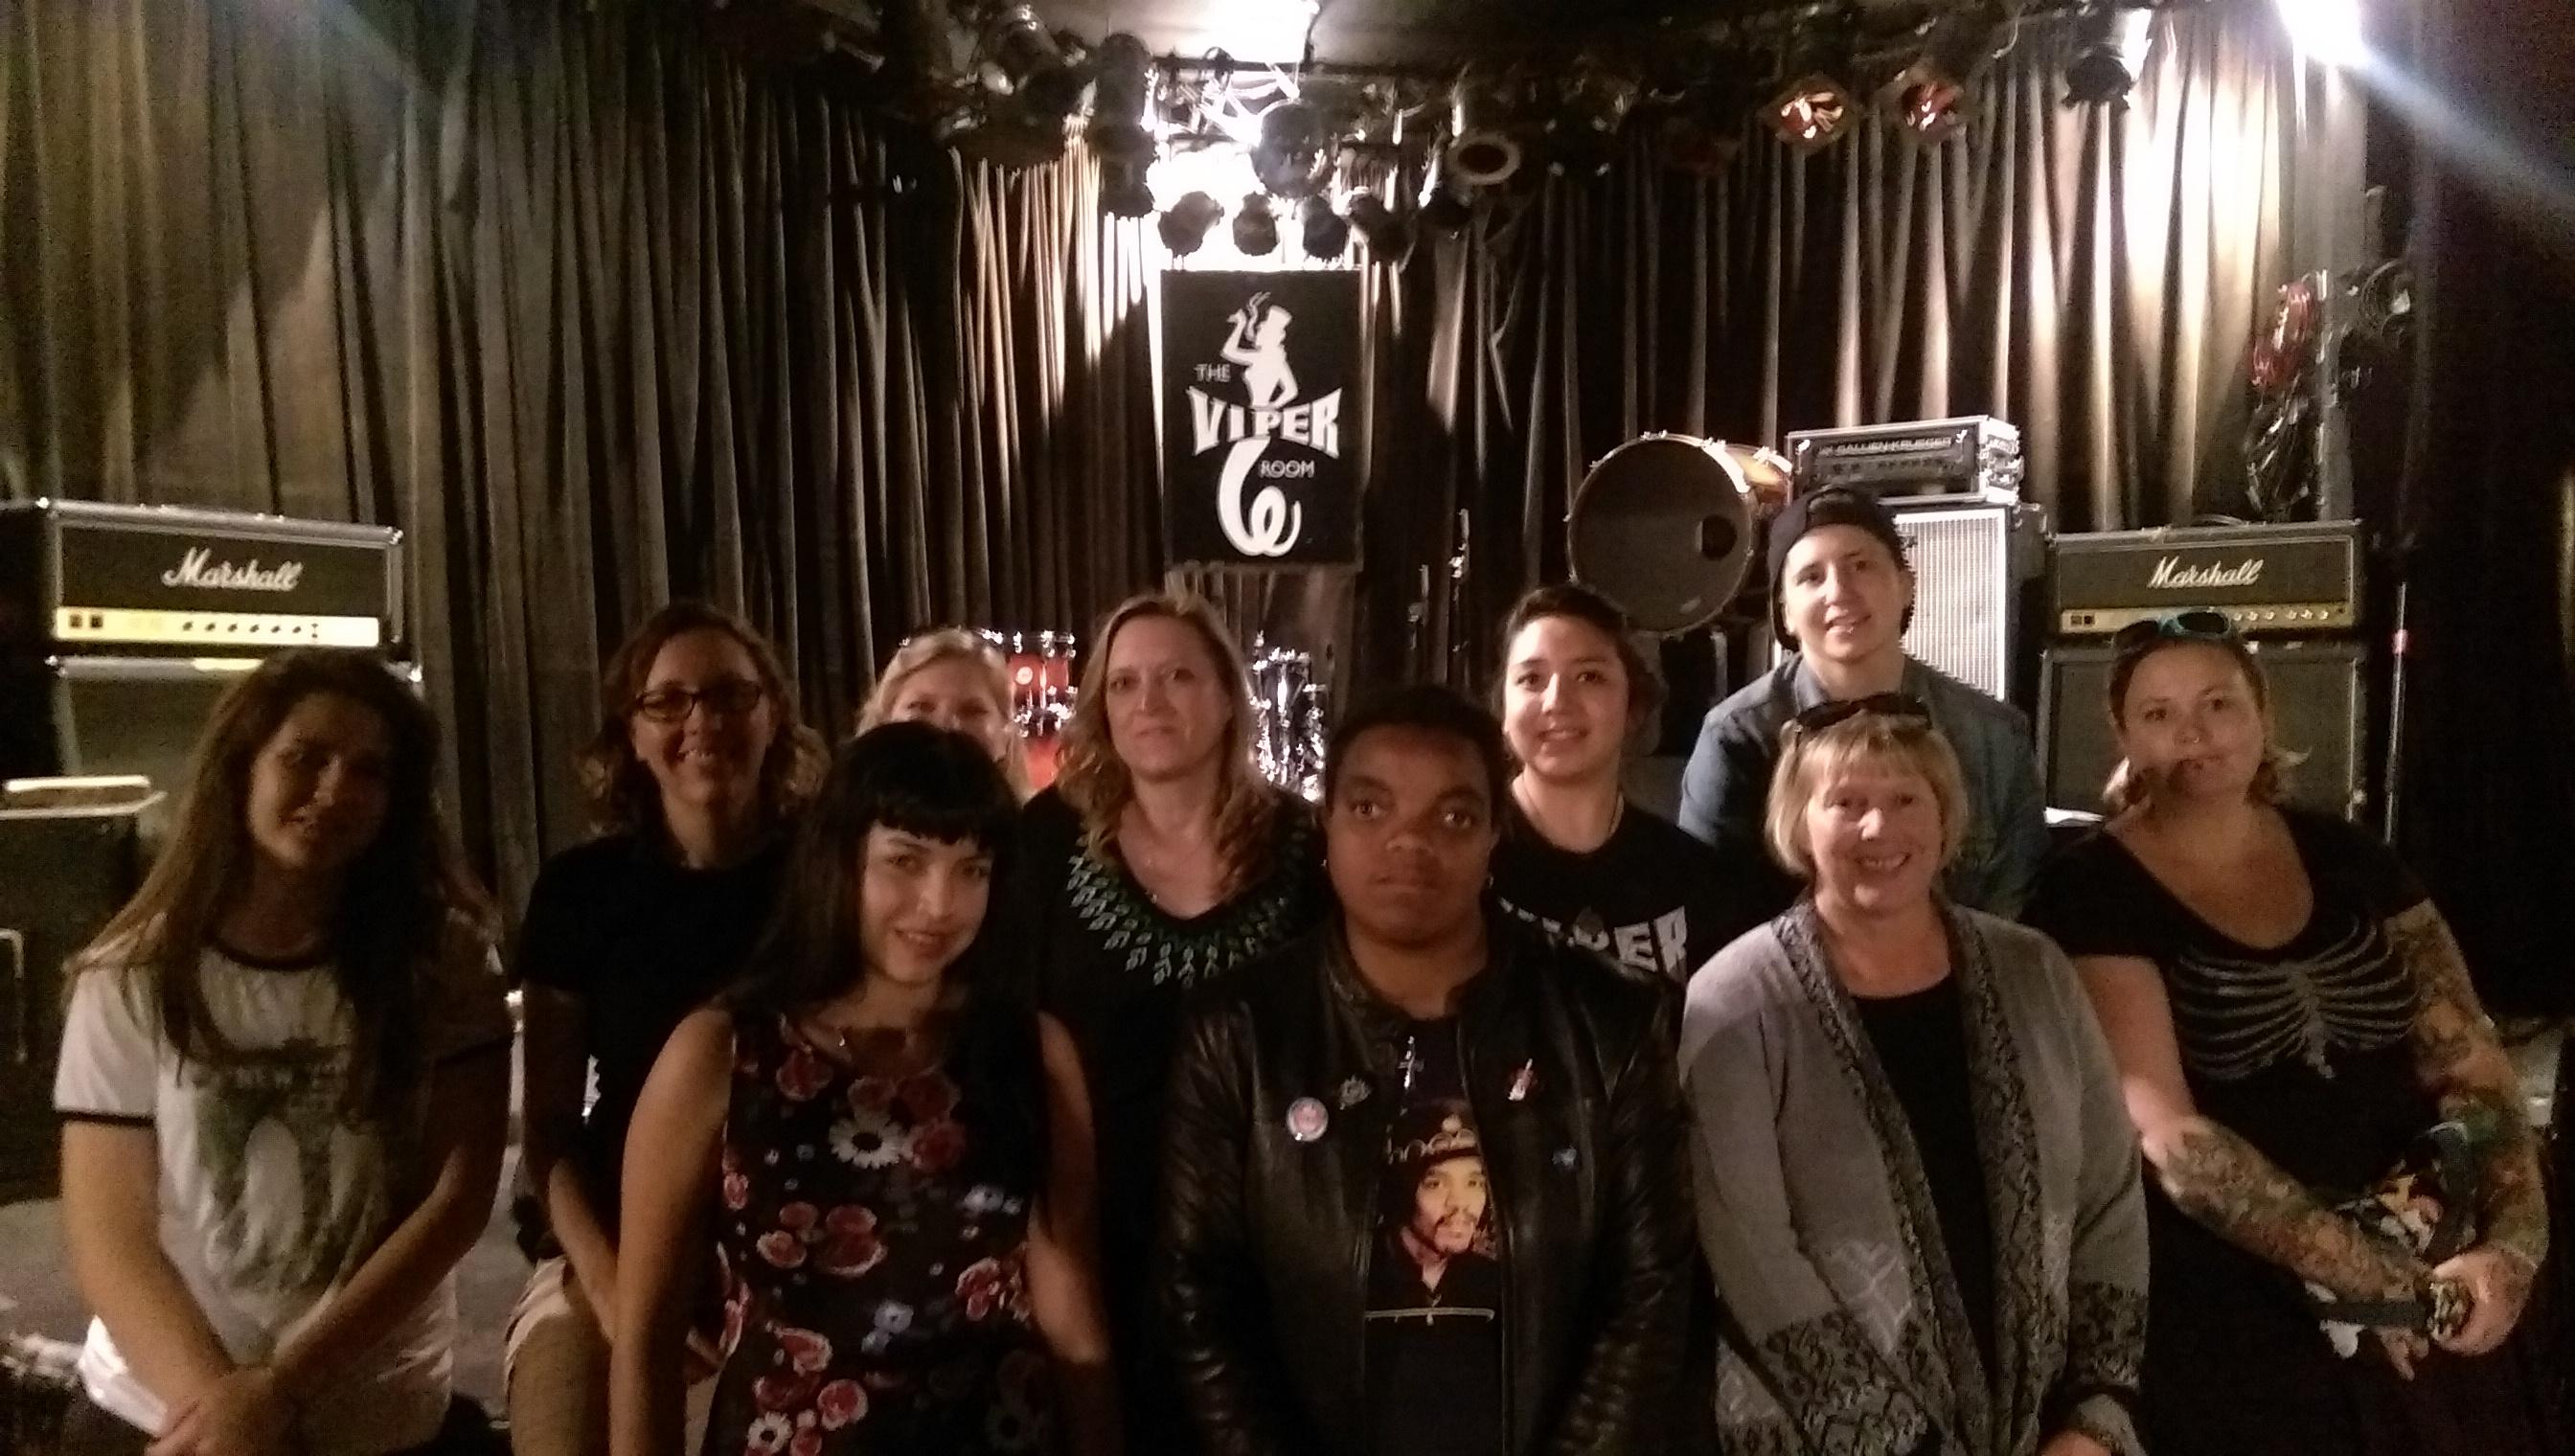 The Viper Room Meet Up – SoundGirls.org